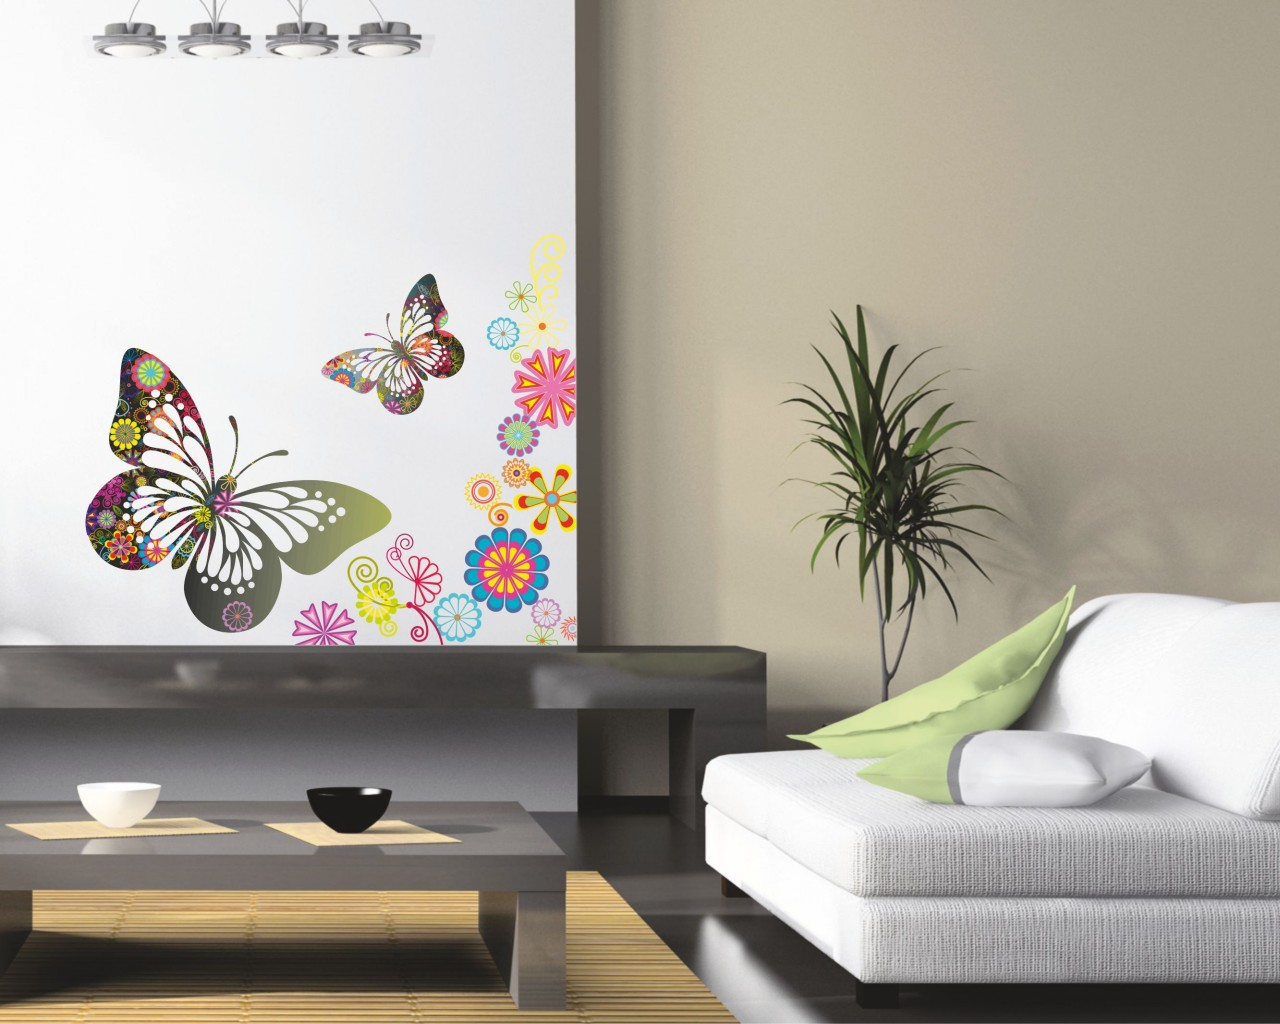 adesivo murale-fantasie con farfalle